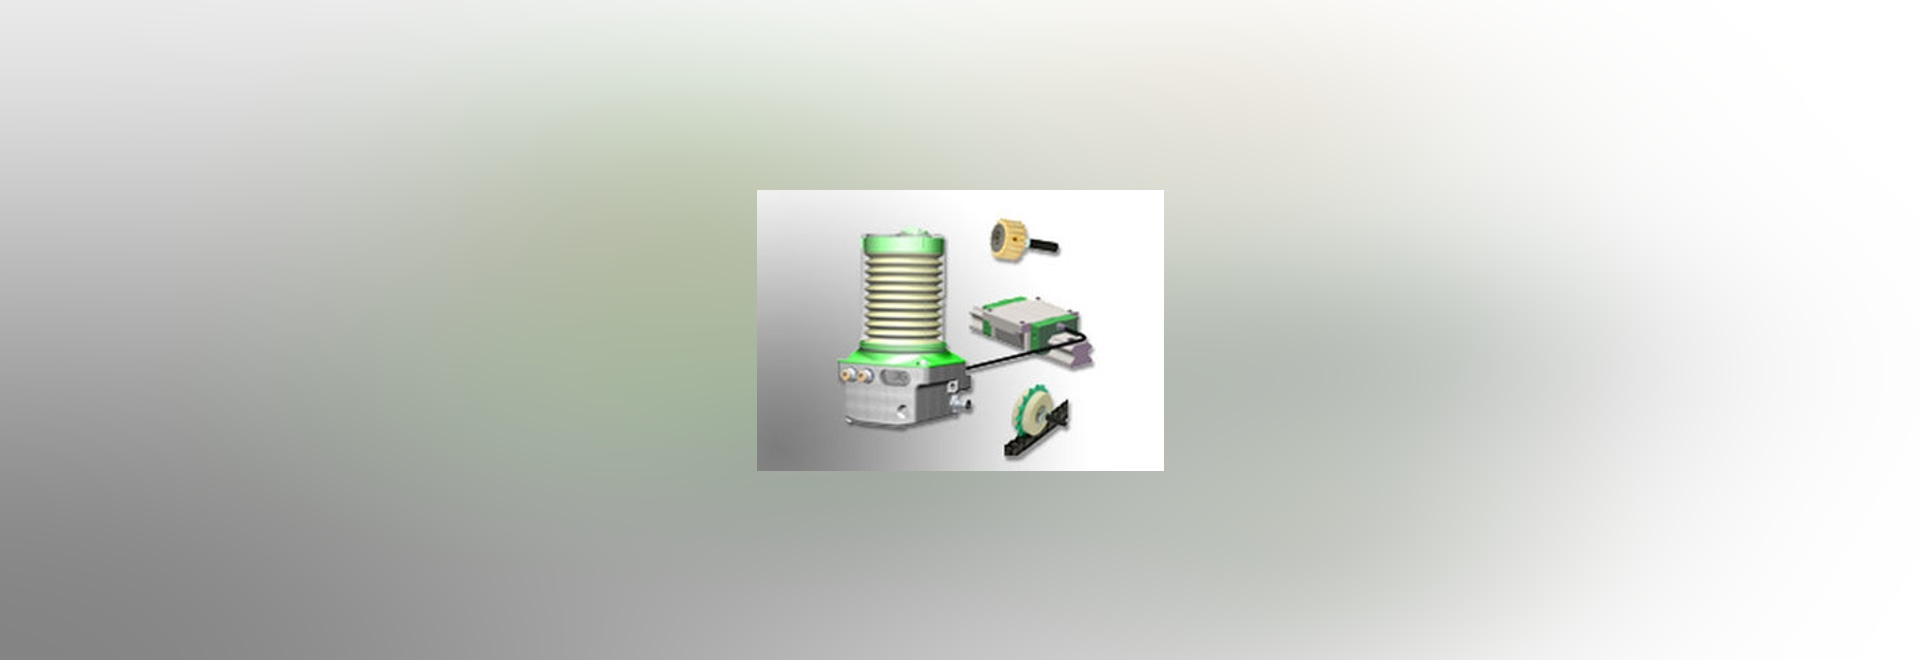 NEW: automatic lubrication system by Andantex USA Inc - Andantex USA Inc